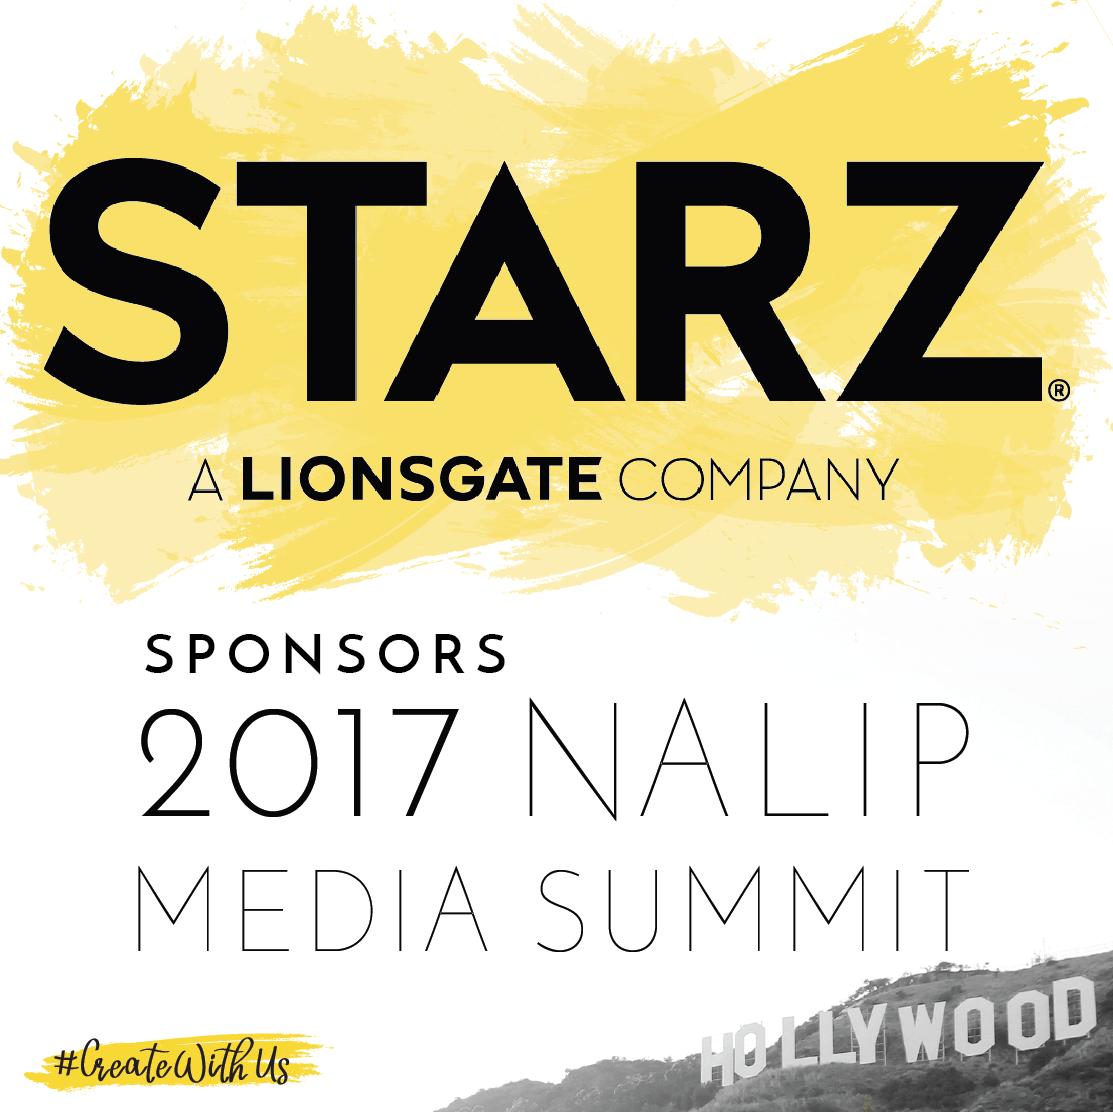 NL_sponsor-Starz.png